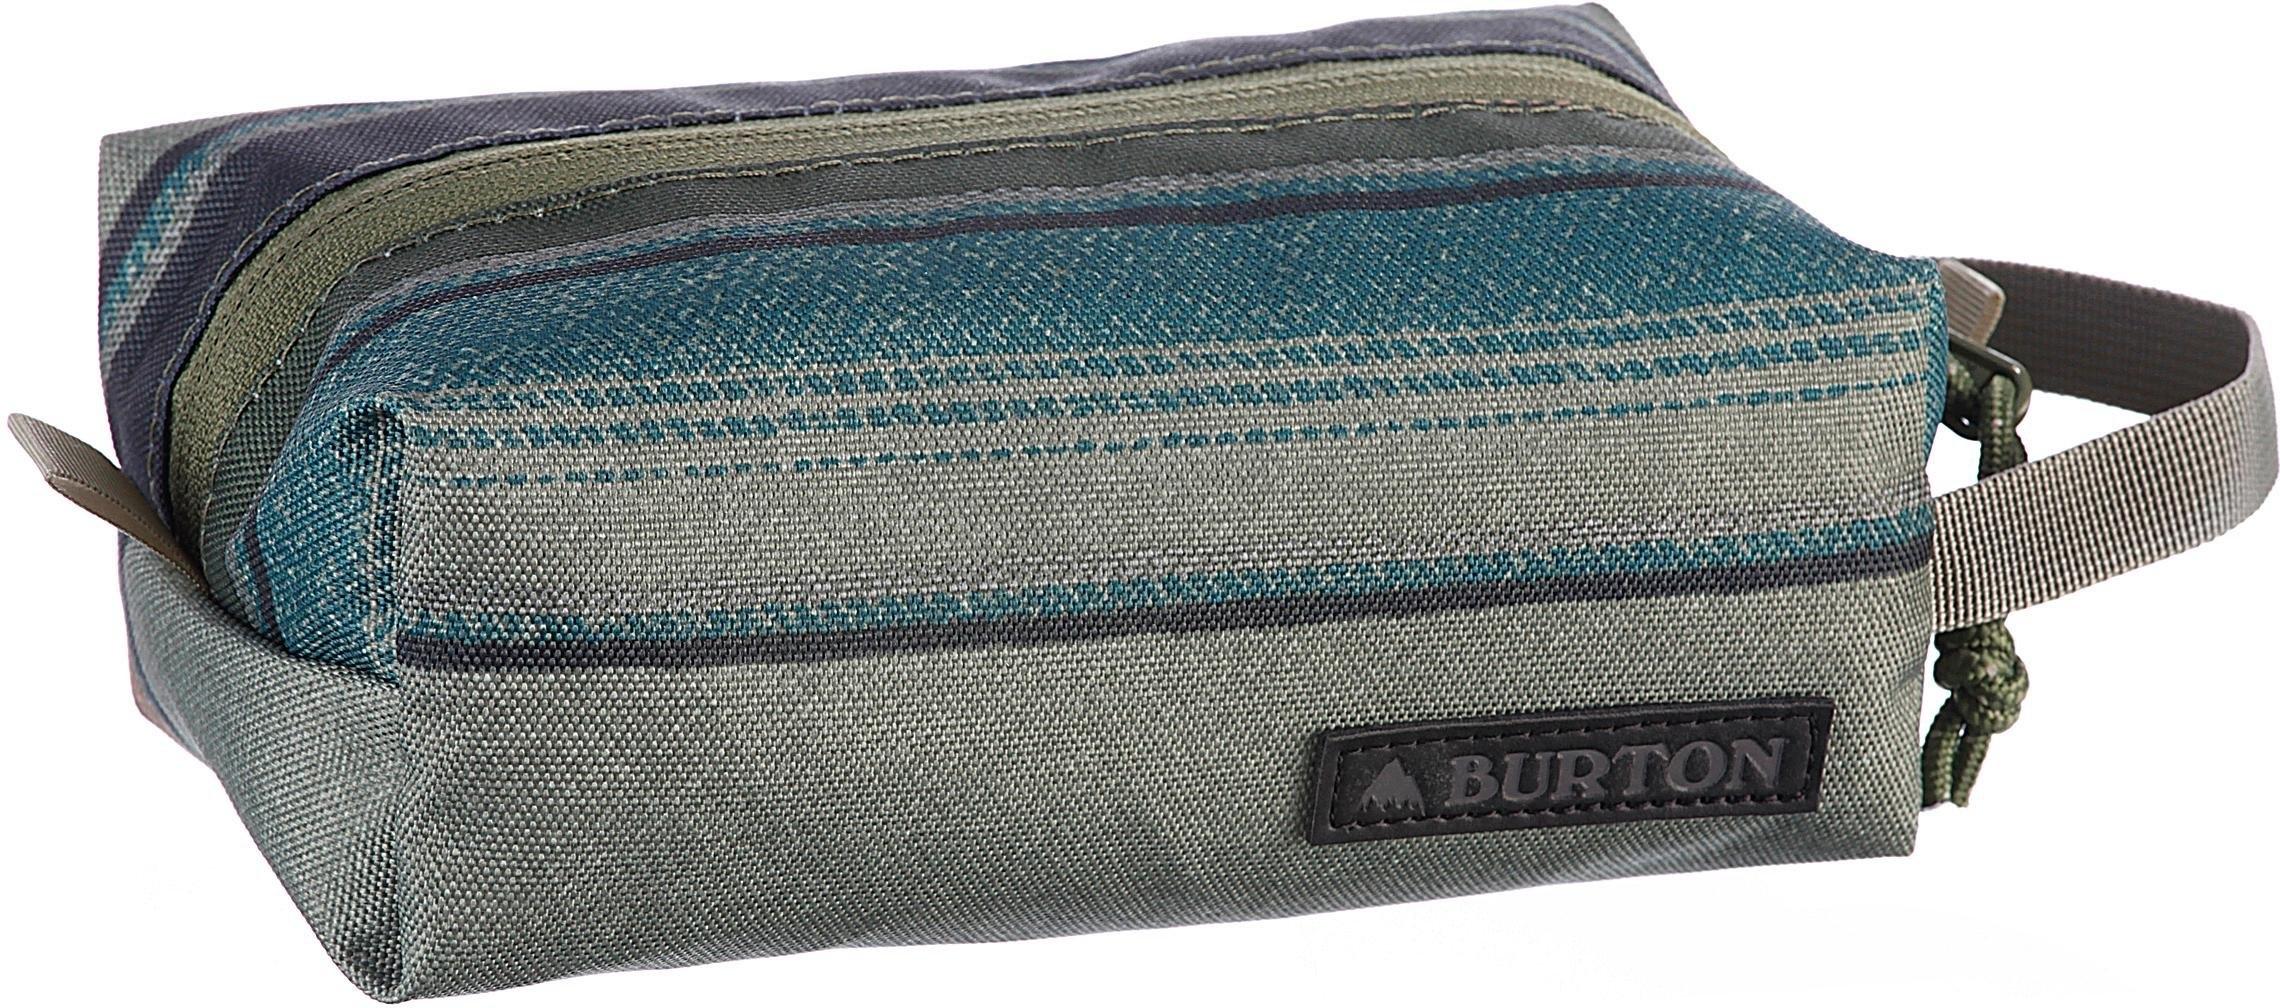 Burton Dg Burton toilettas, »Accessory Case, Tusk Stripe Print« veilig op otto.nl kopen